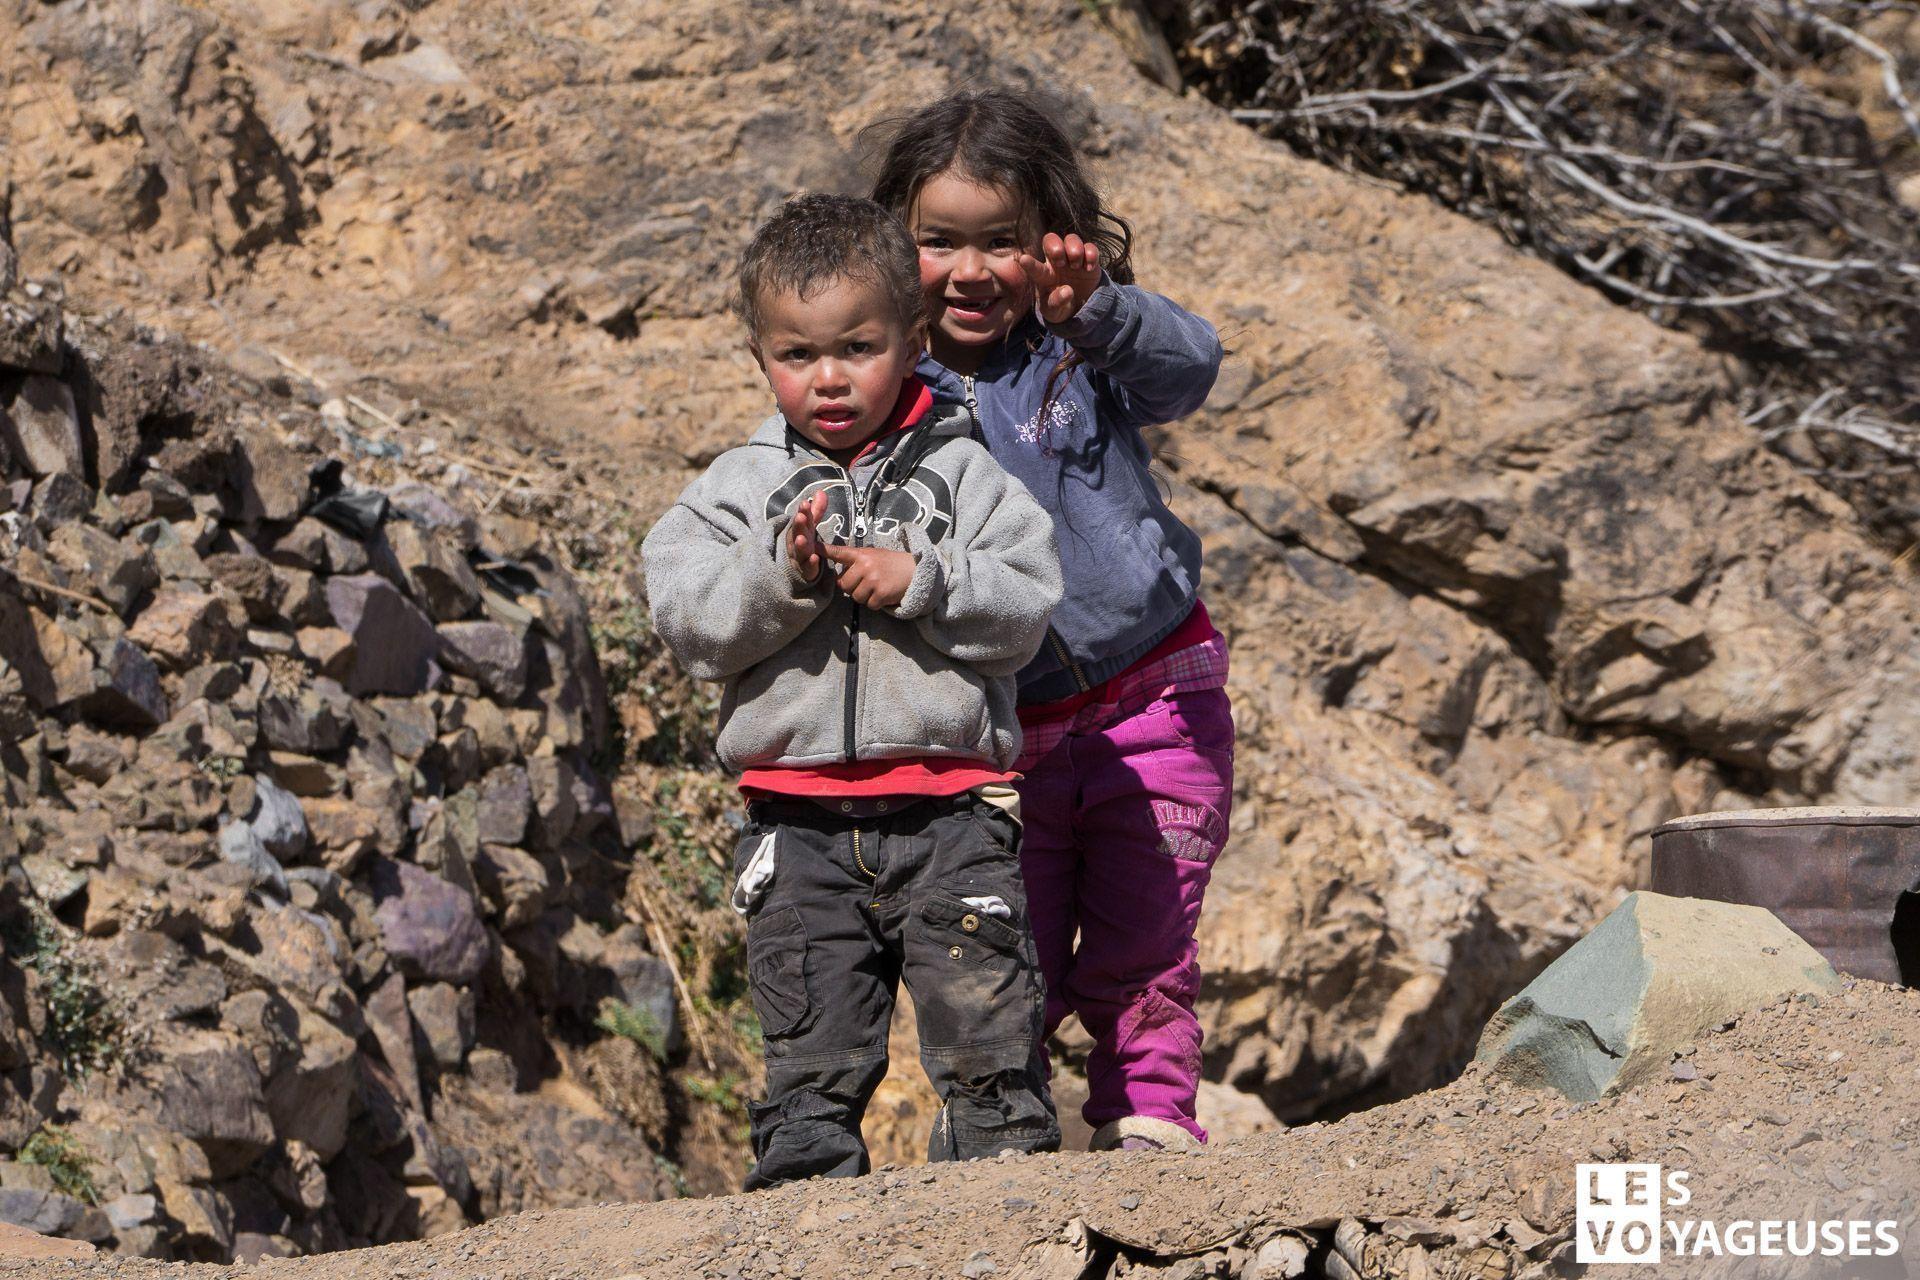 Les-voyageuses-maroc-imlil-hiver-00033